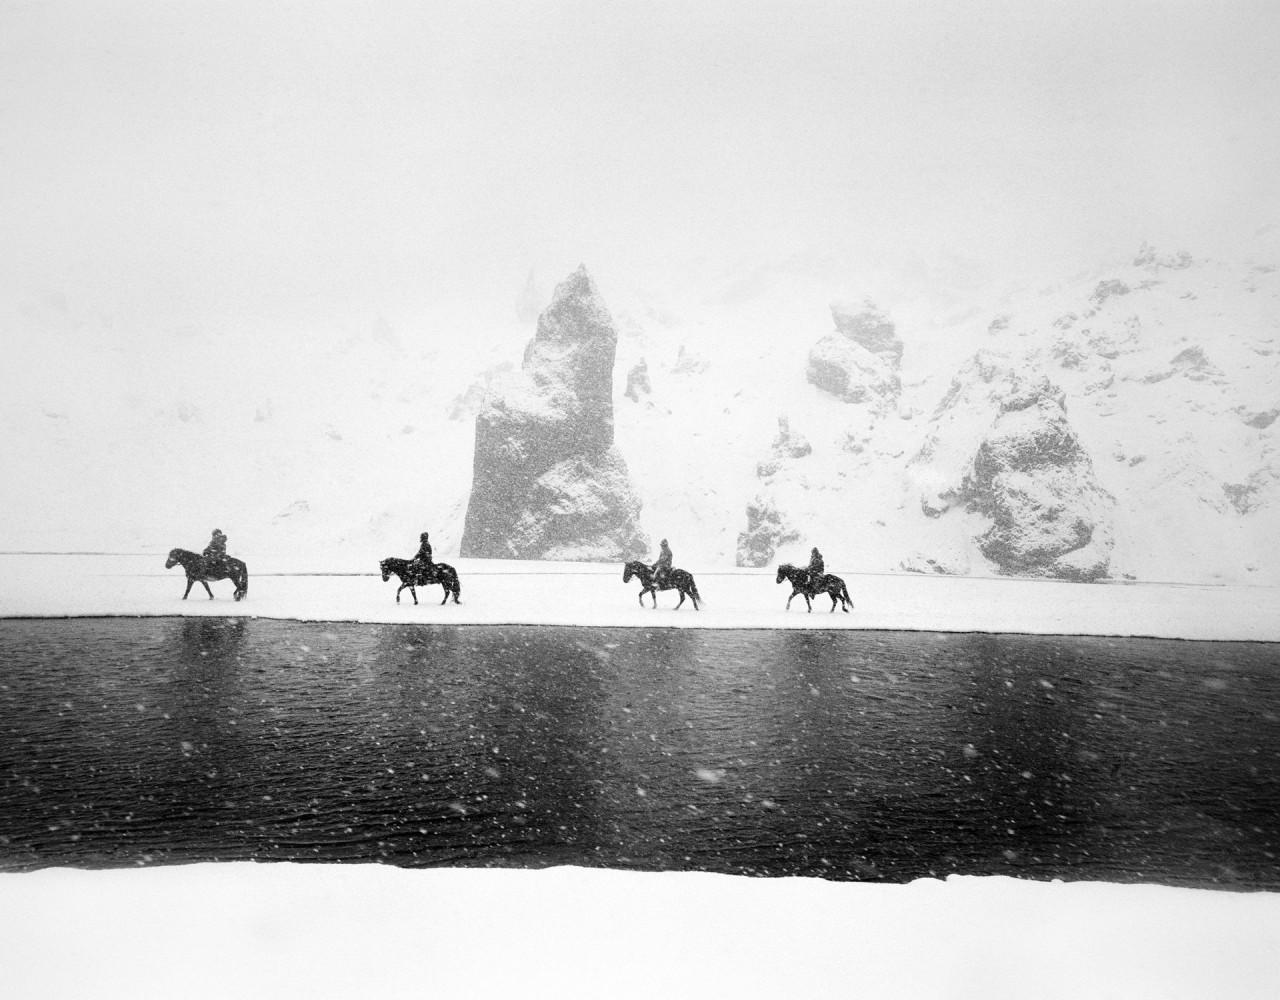 За горами. Фотограф Рагнар Аксельссон